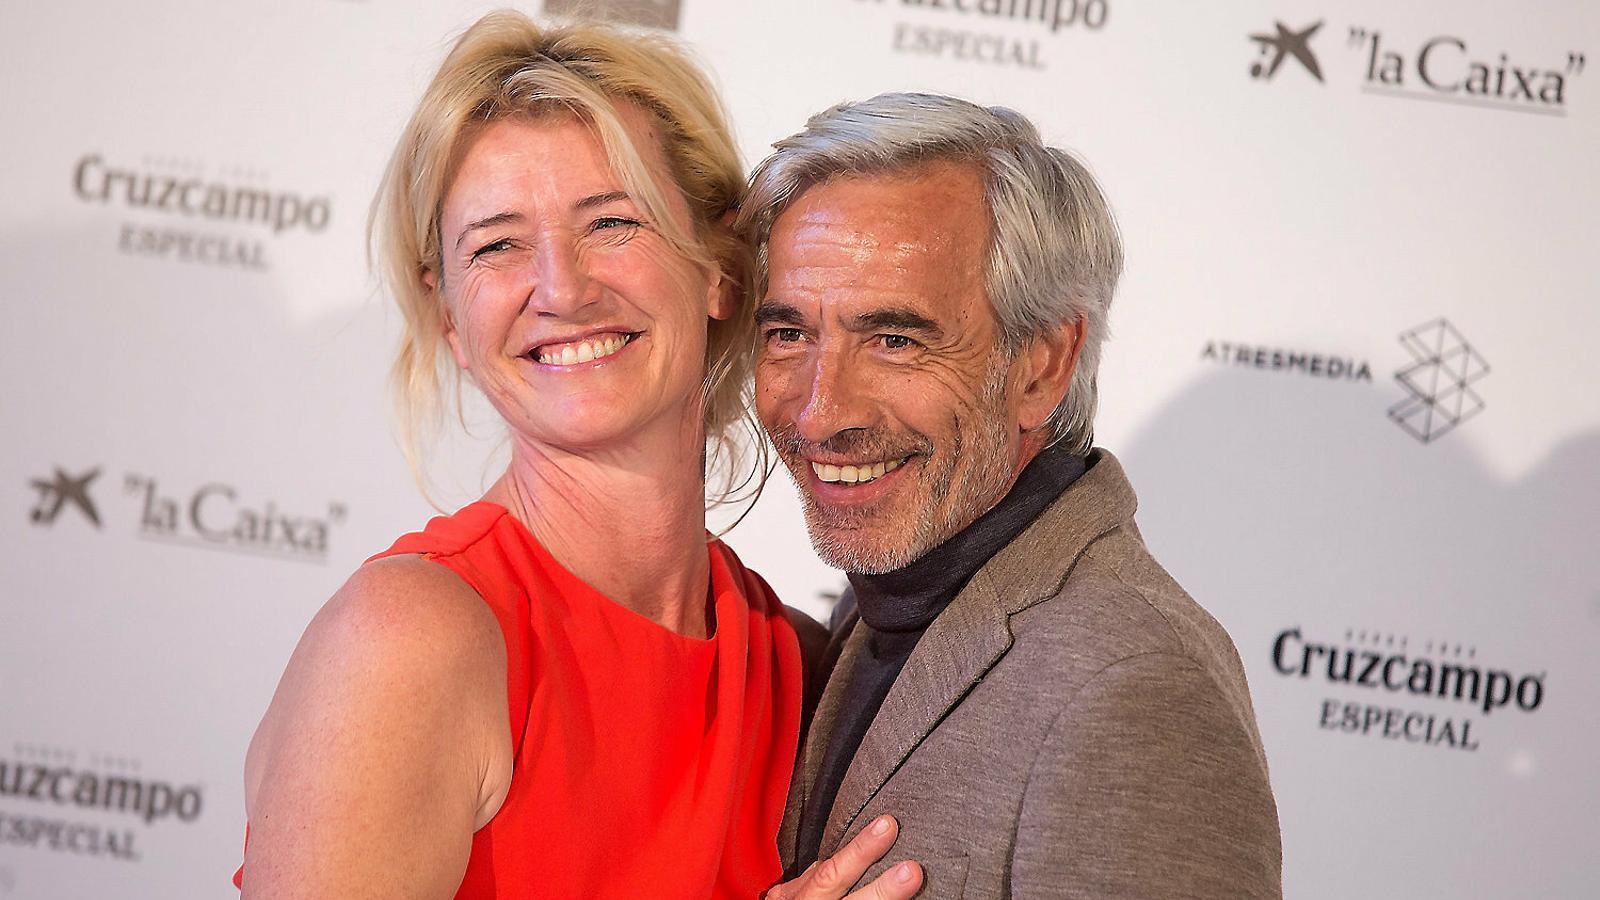 Envien a judici Imanol Arias i Ana Duato per frau milionari a Hisenda